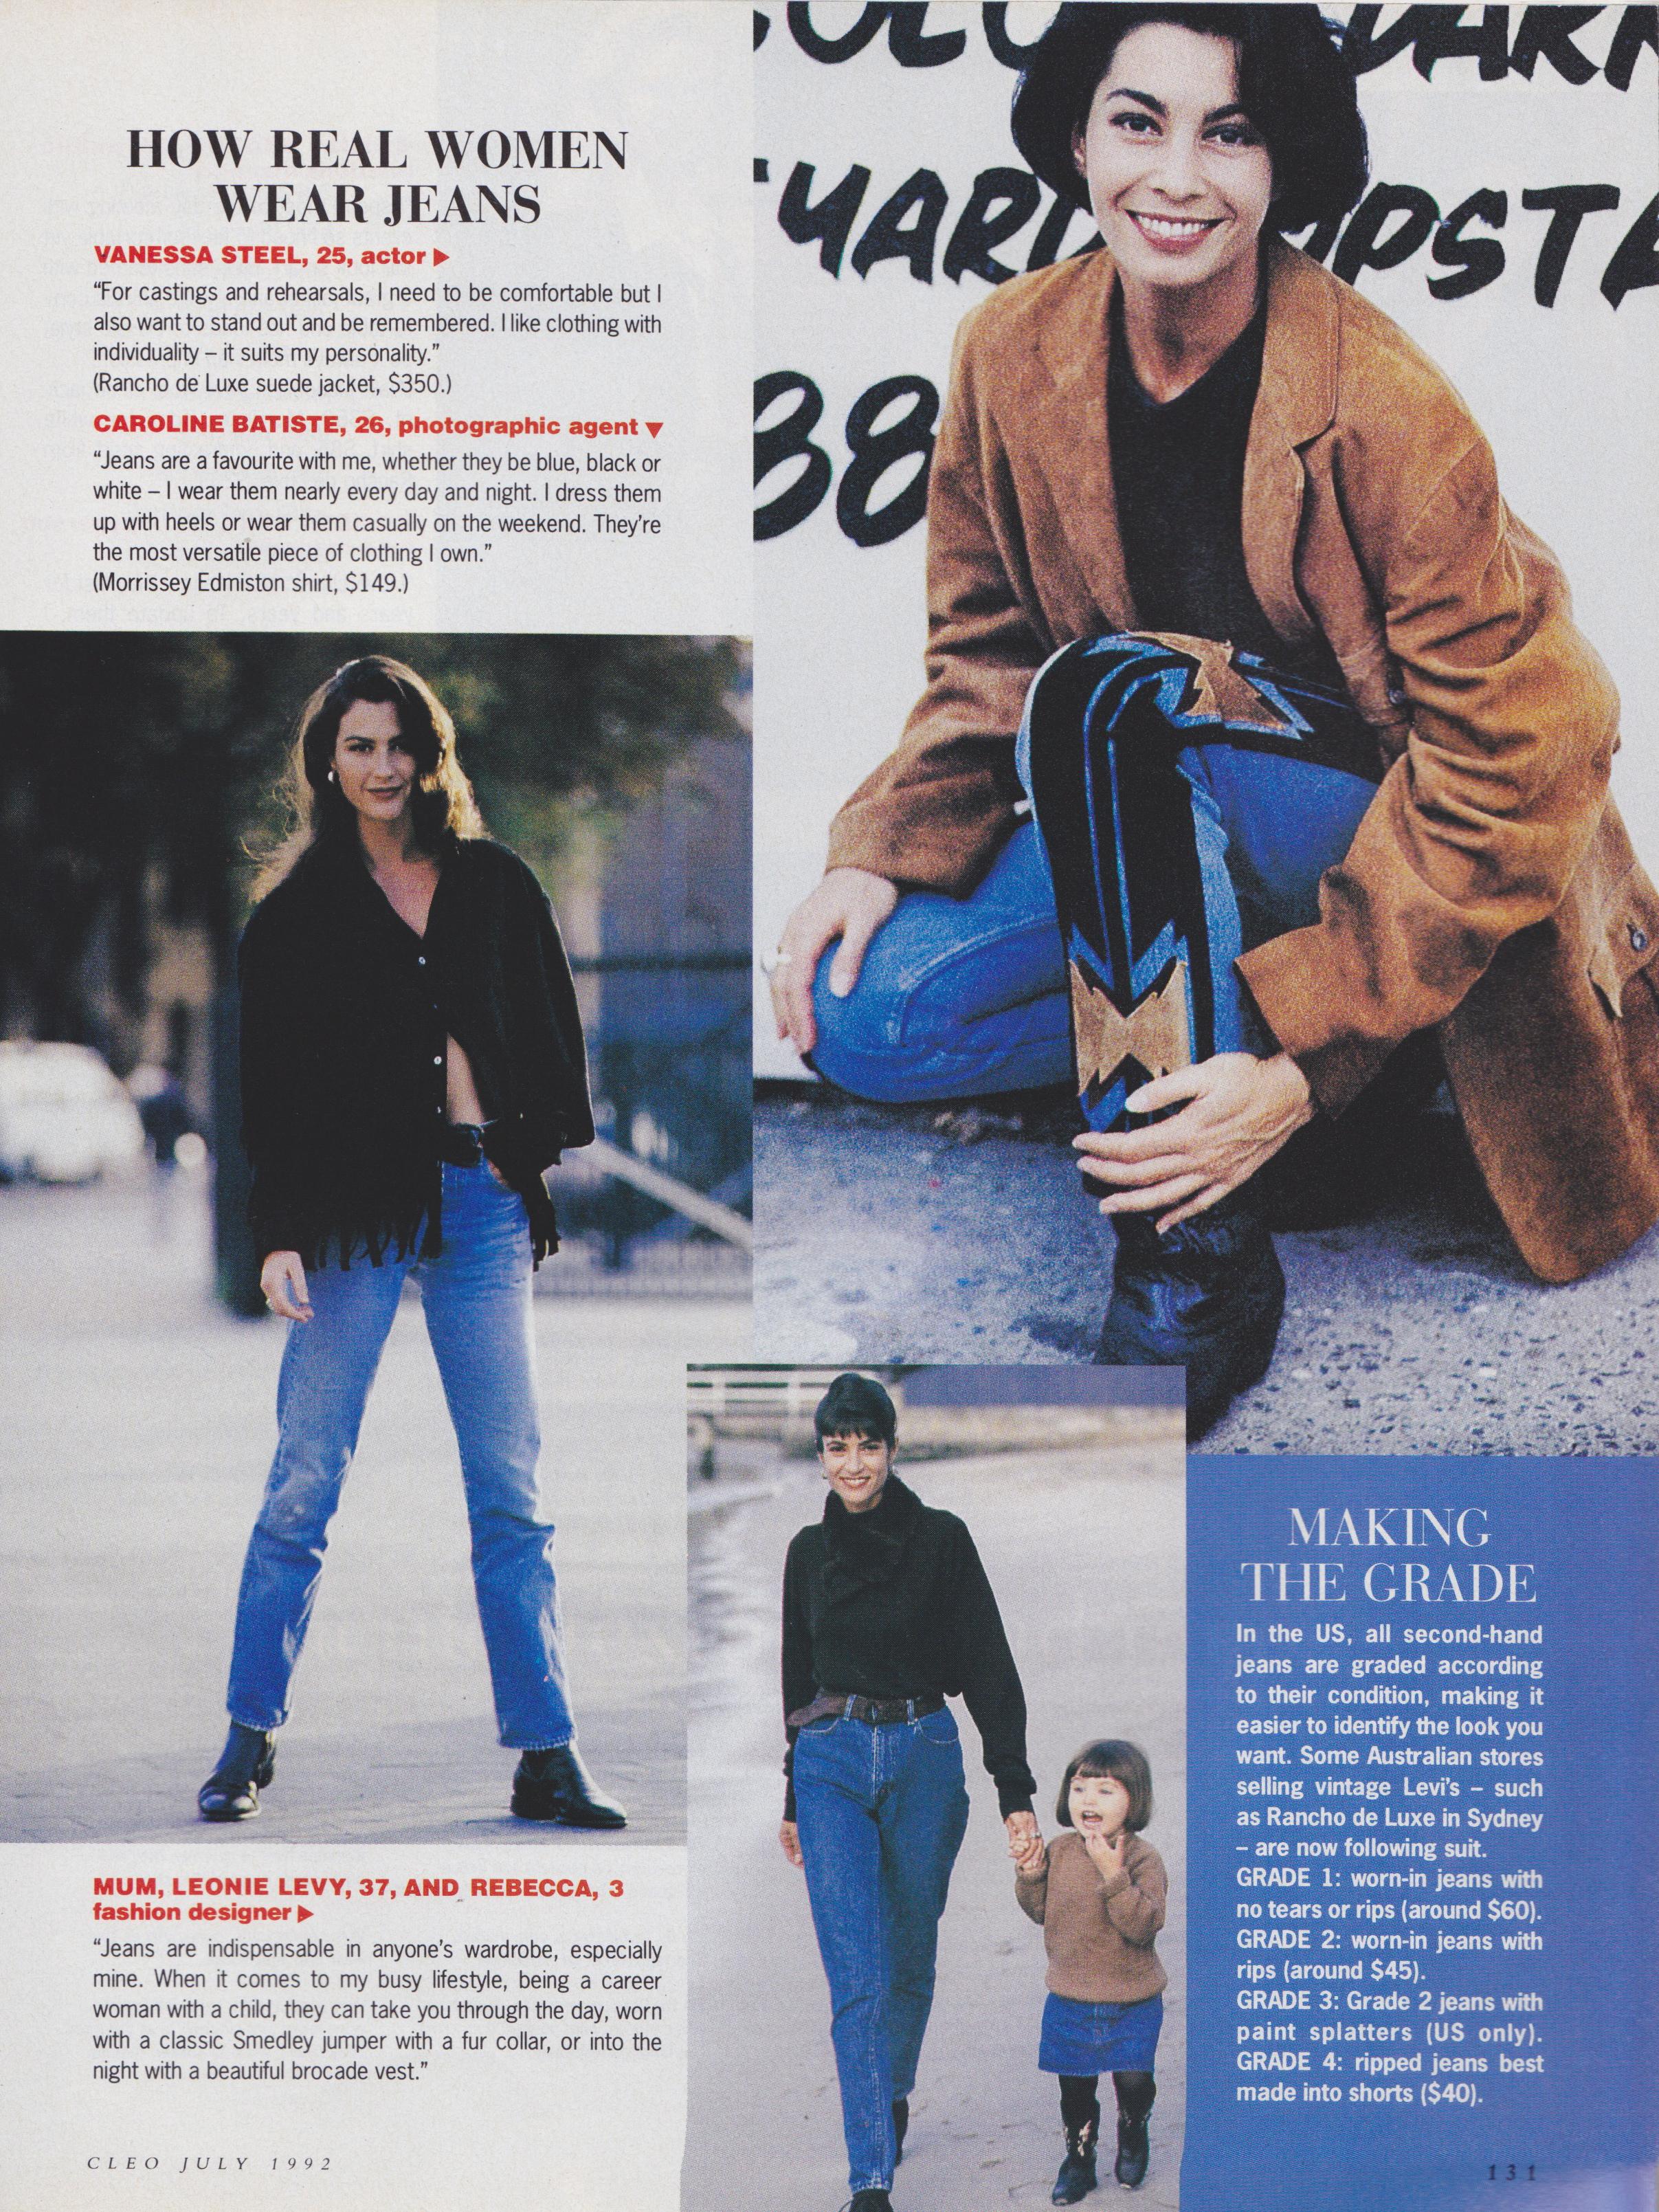 Cleo July 1992 | Denim (Anna Louise Gould) 04.jpeg